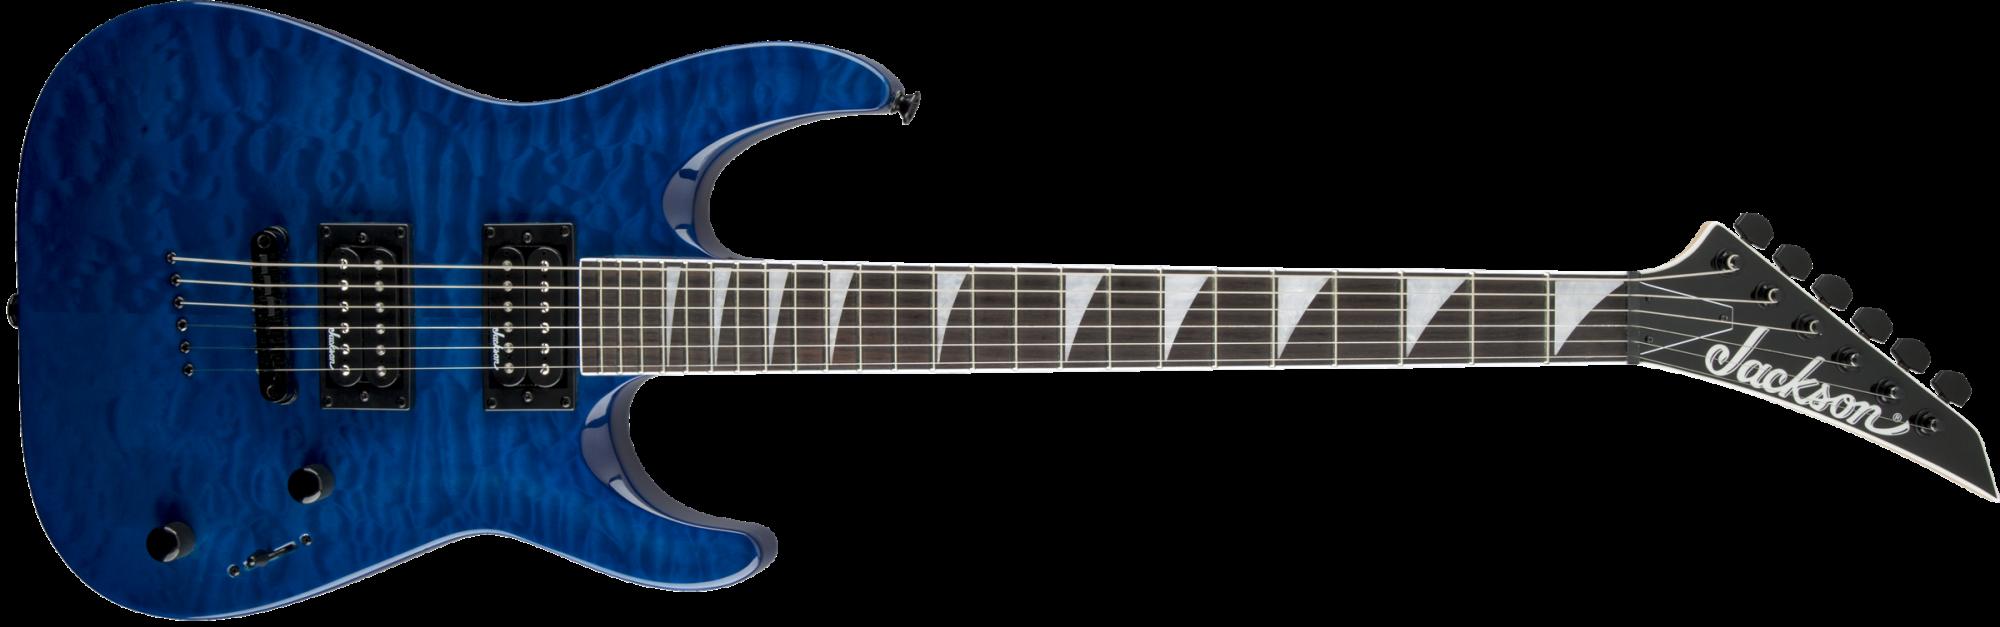 Jackson JS32TQ Dinky DKA Quilt Maple Top Electric Guitar - Trans Blue